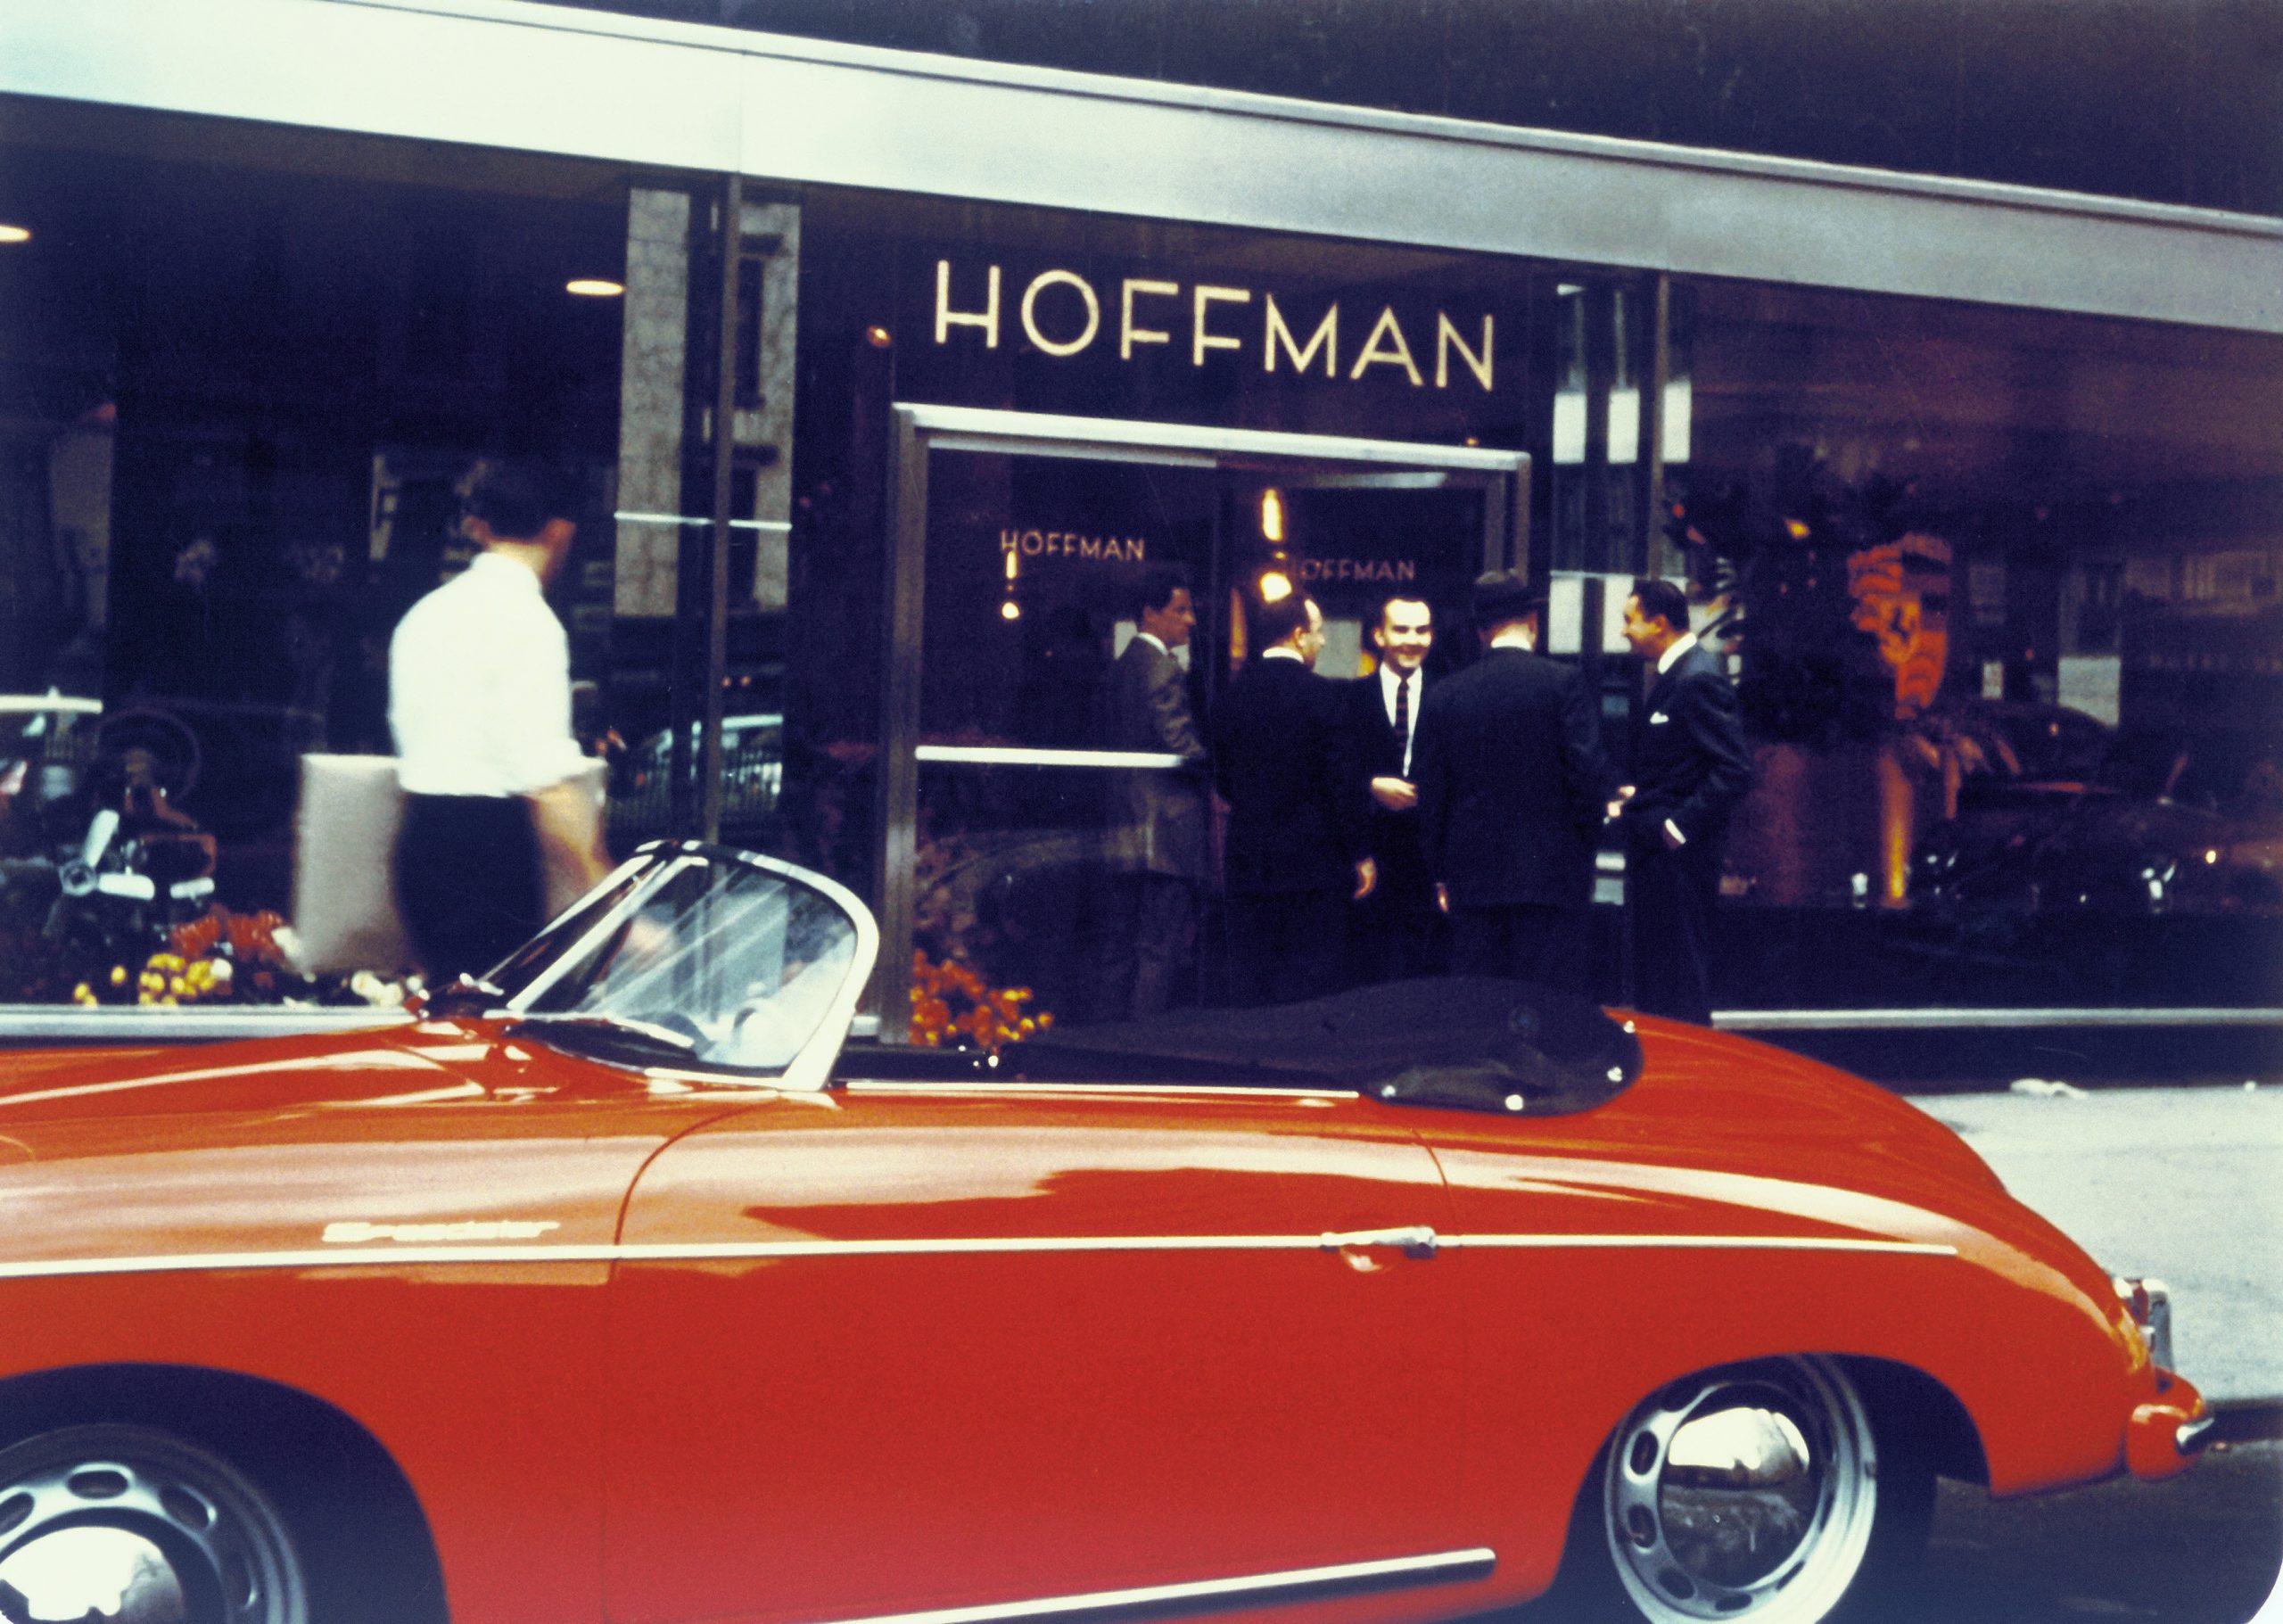 1955 porsche 356 speedster streetside hoffman motor car company showroom new york city